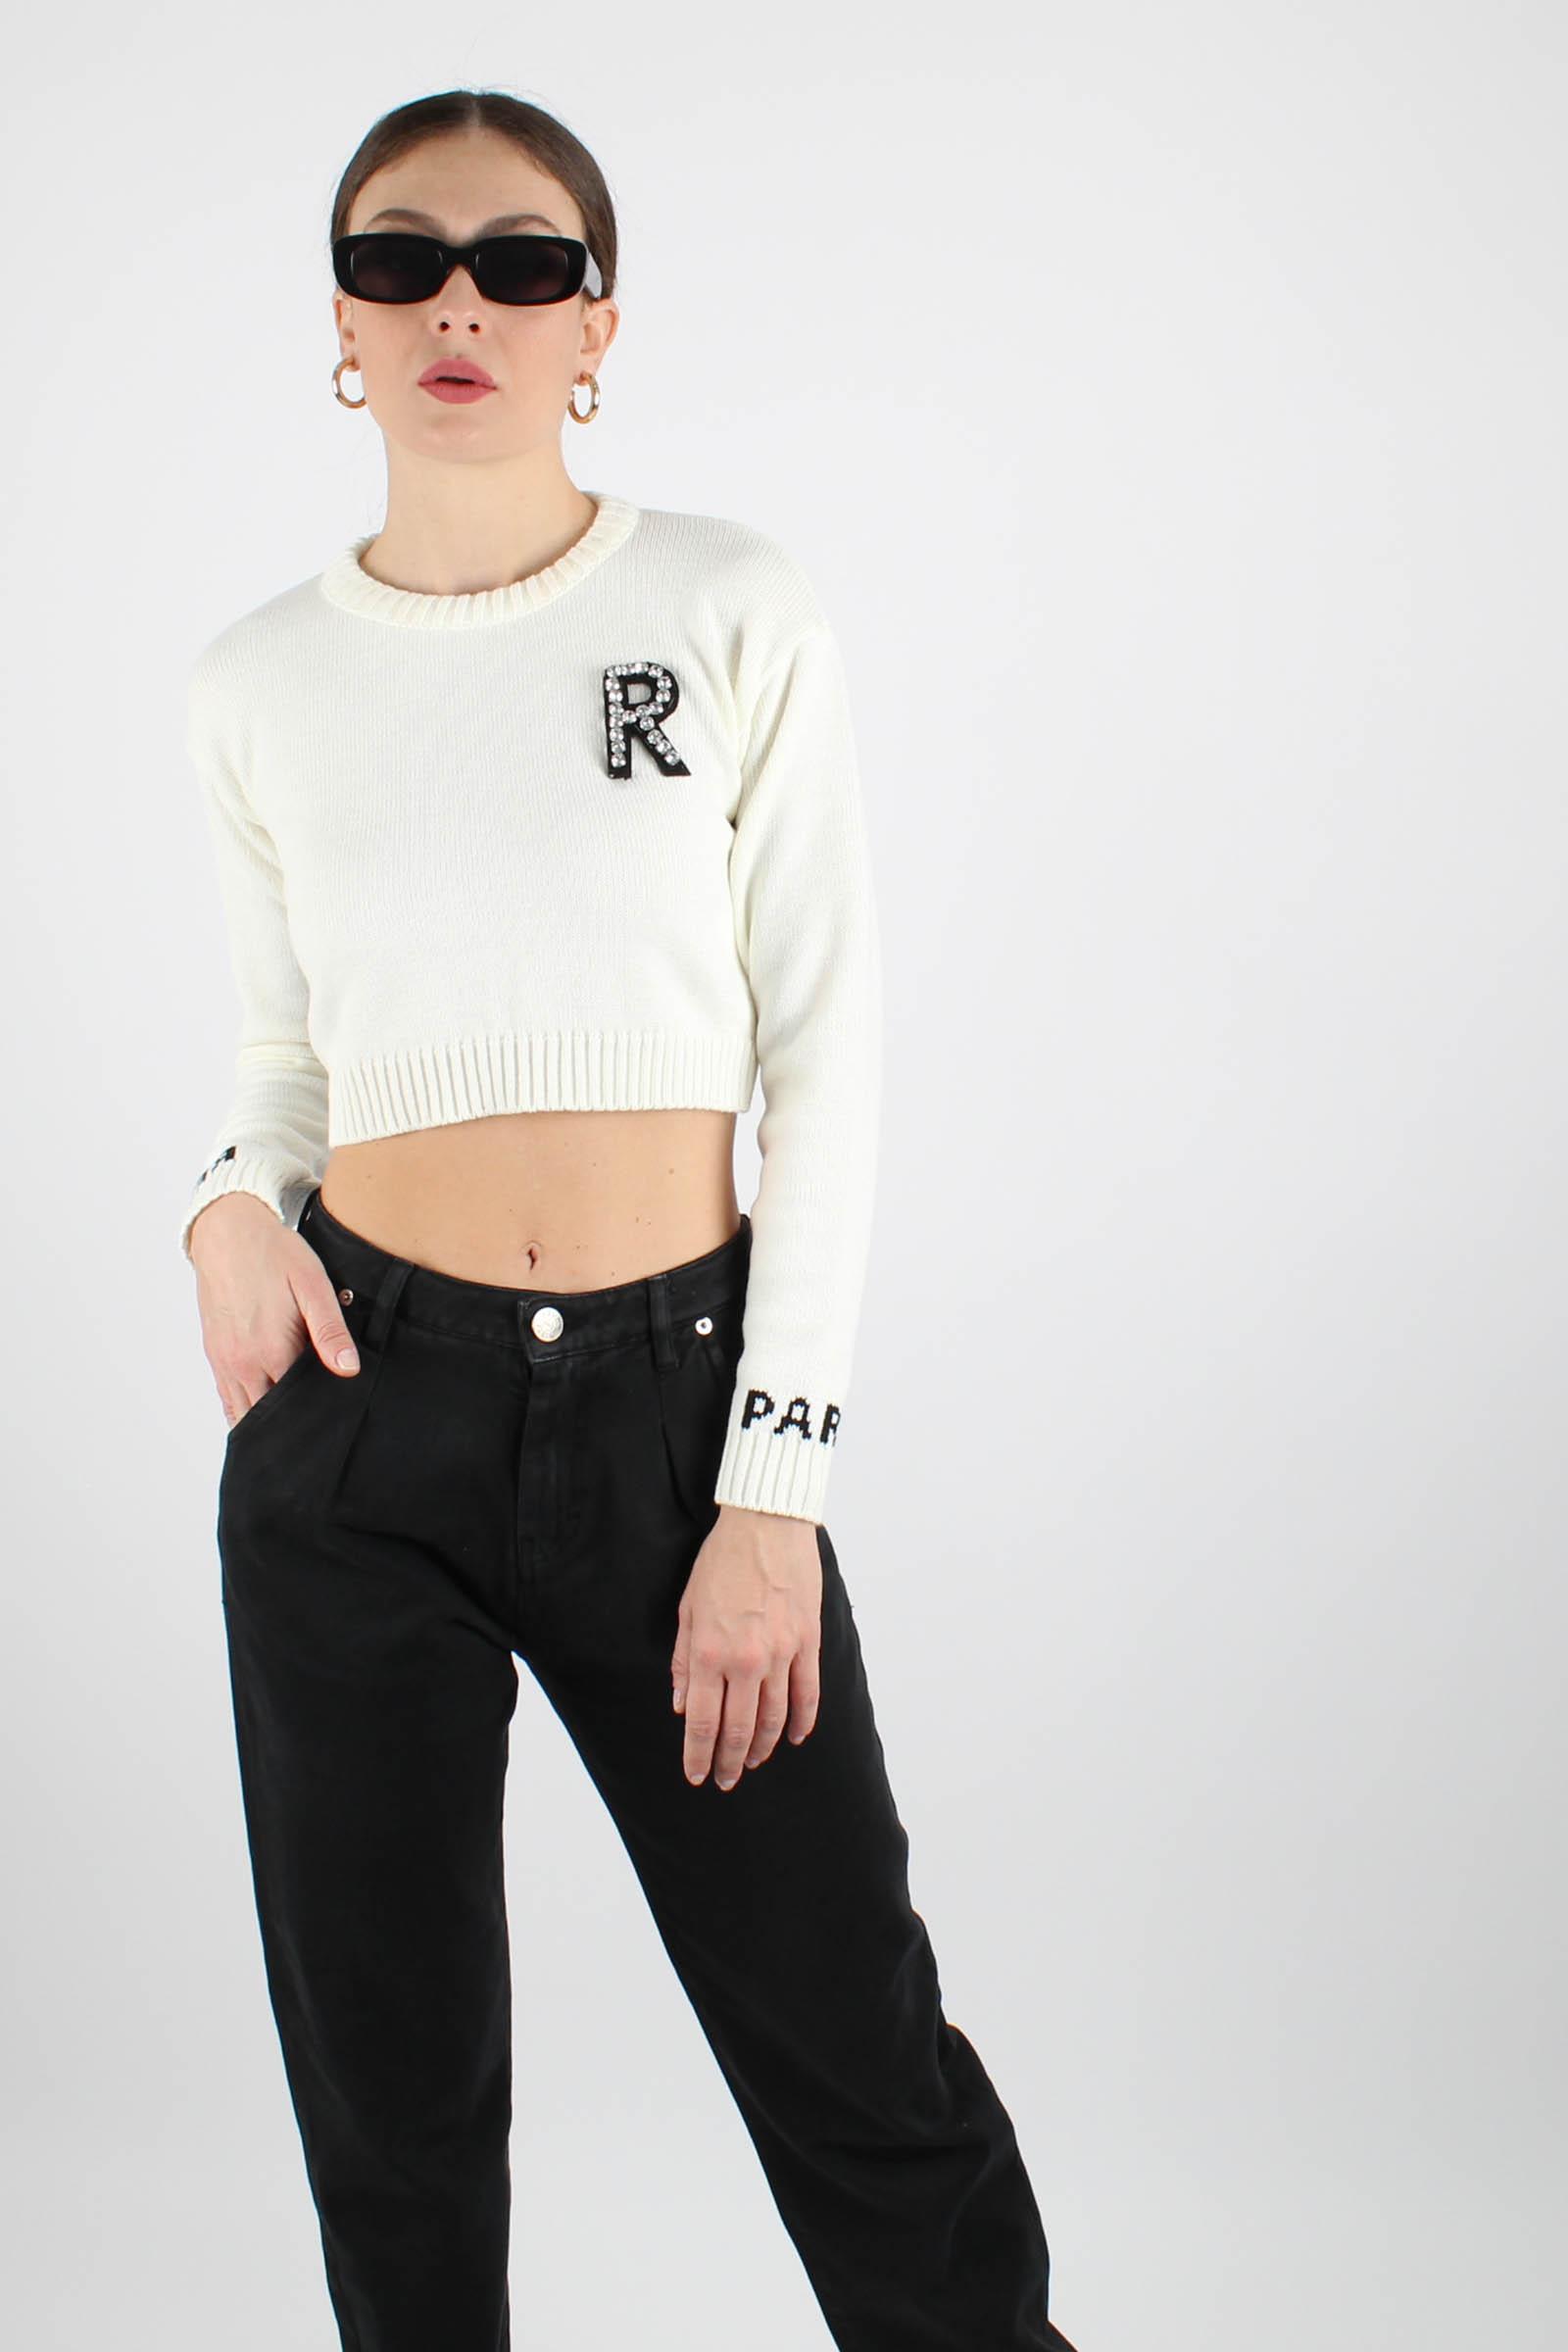 REver paris | Shirt2 | RM02220D2